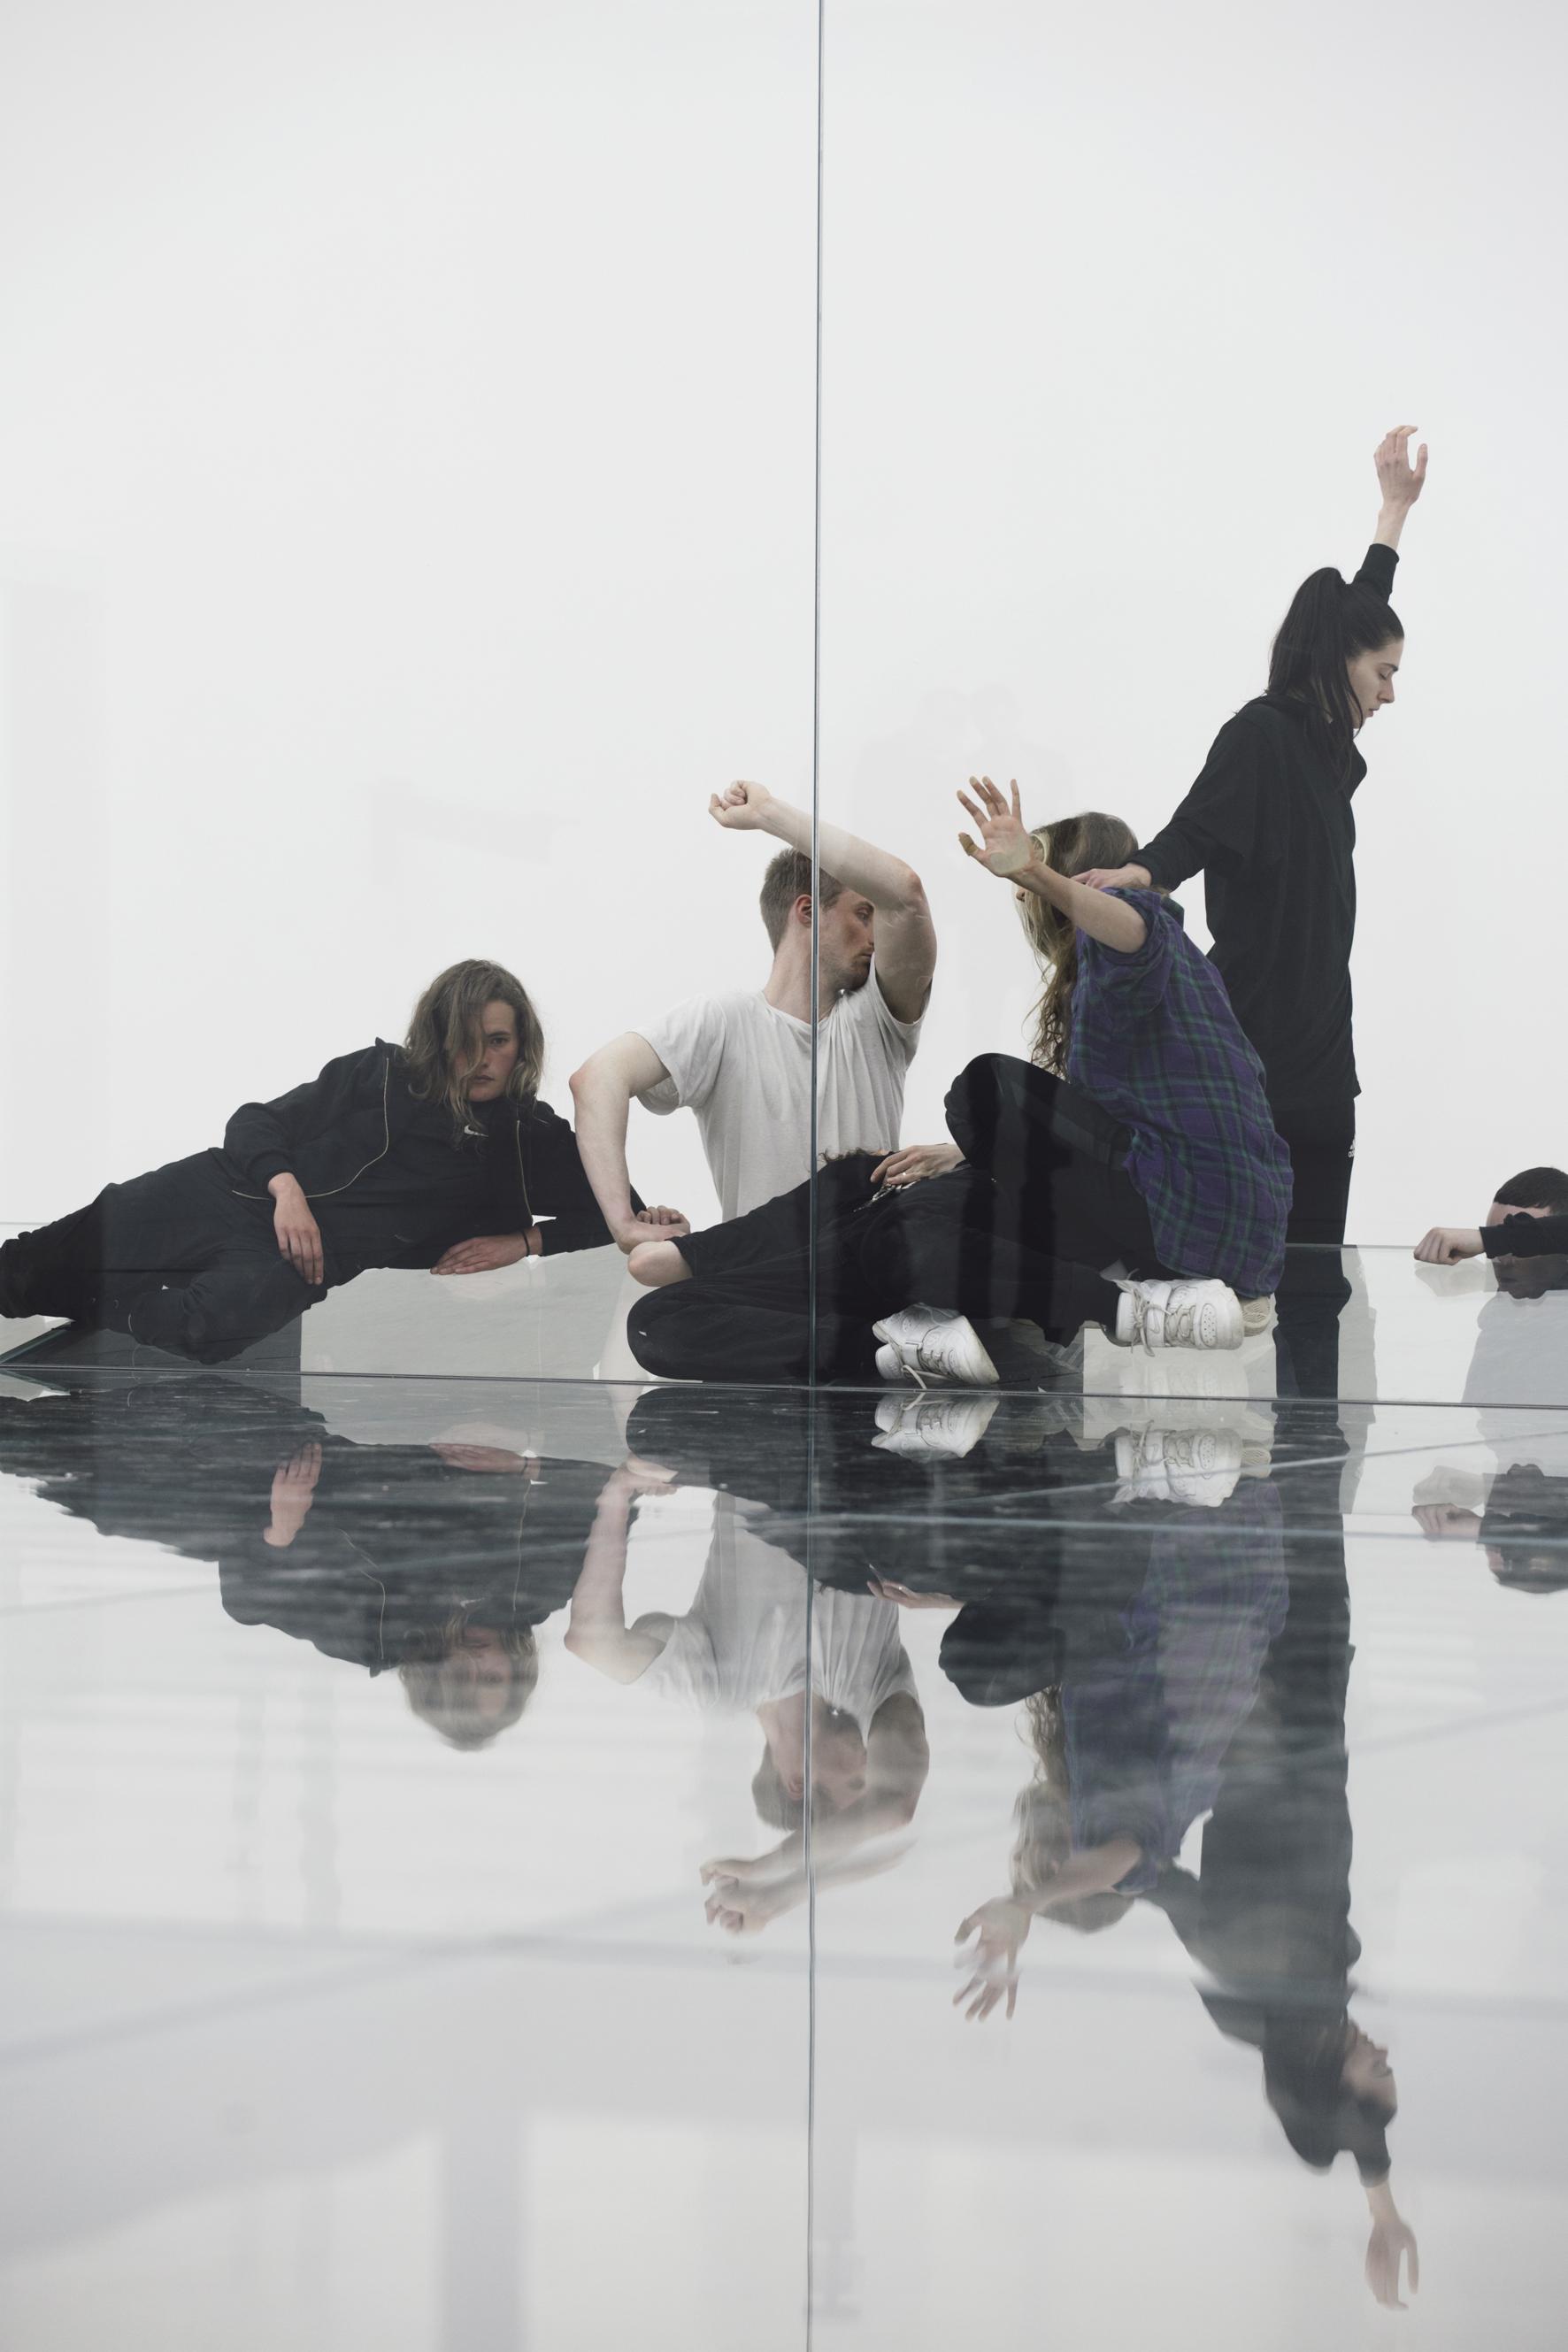 Lea Welsch, Billy Bultheel, Emma Daniel, Franziska Aigner and Mickey Mahar in Anne Imhof:  Faust , 2017; © Anne Imhof, photo: Nadine Fraczkowski